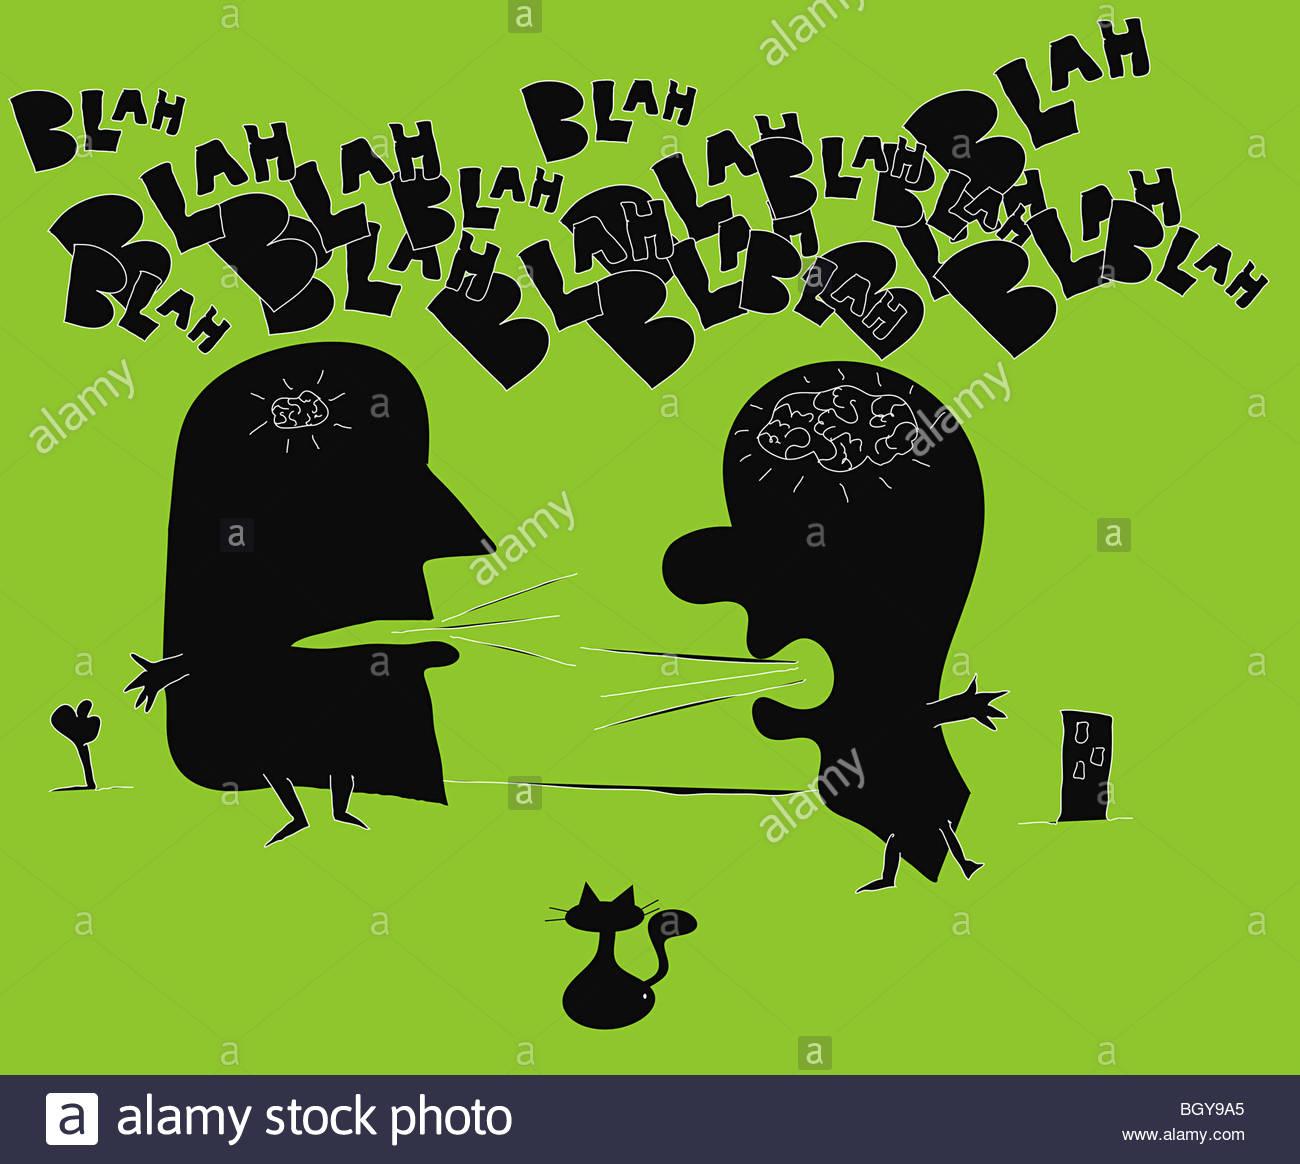 People having argument - Stock Image